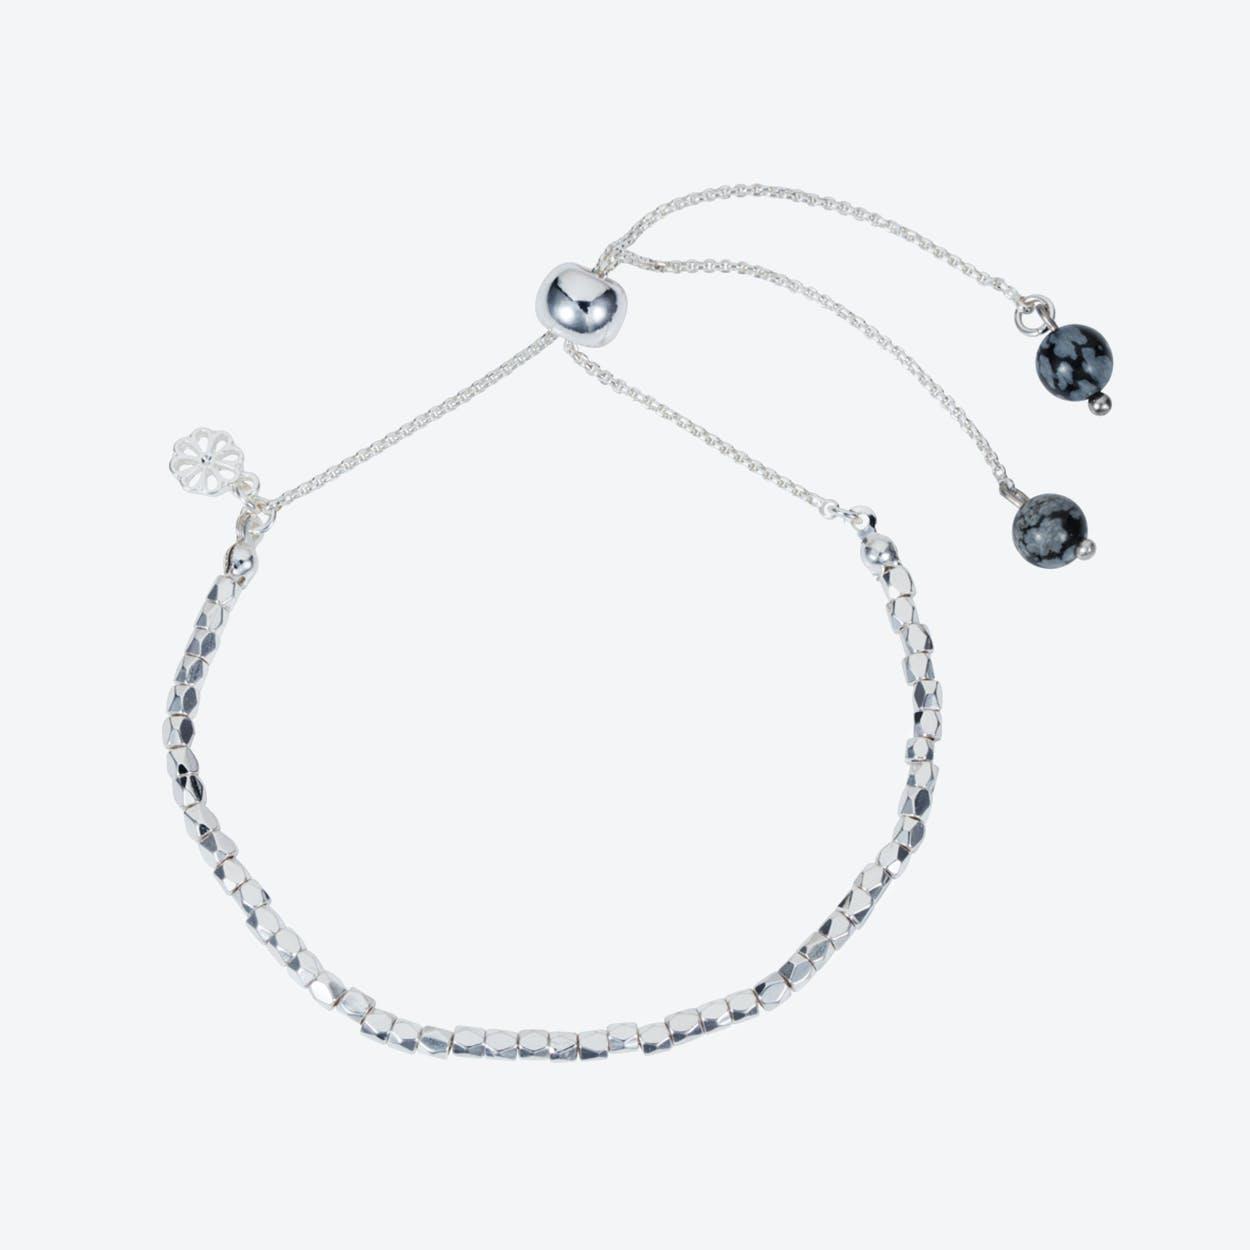 Friendship Bracelet – Silver with Snowflake Obsidian